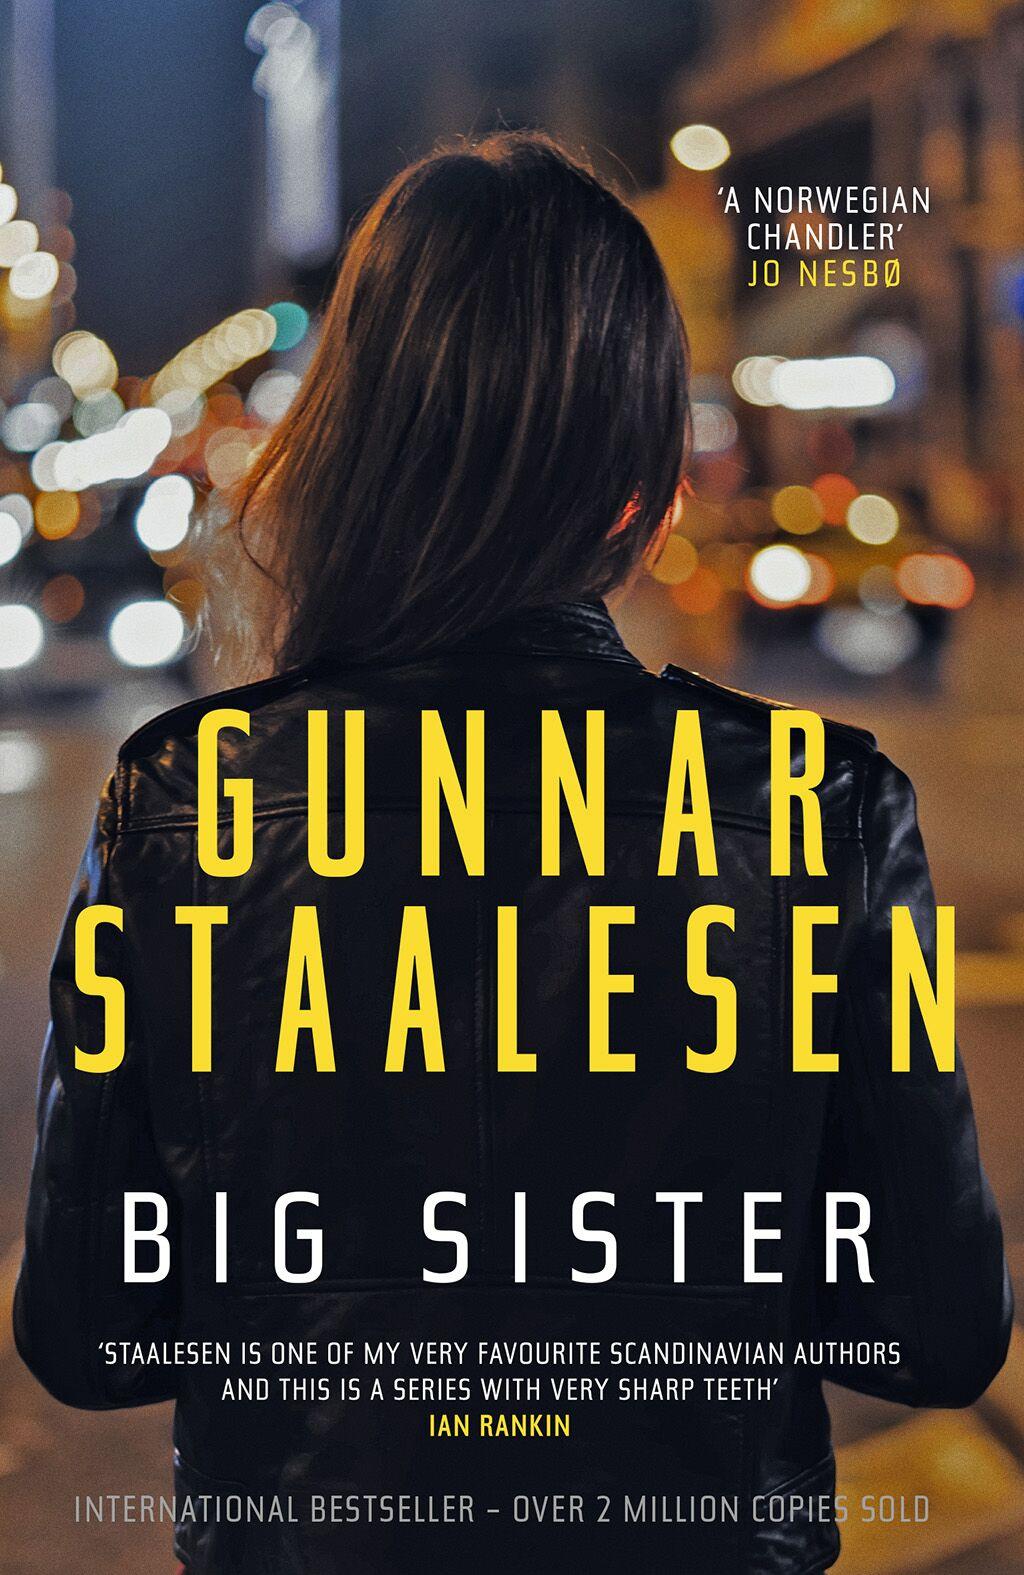 Big Sister Cover Image